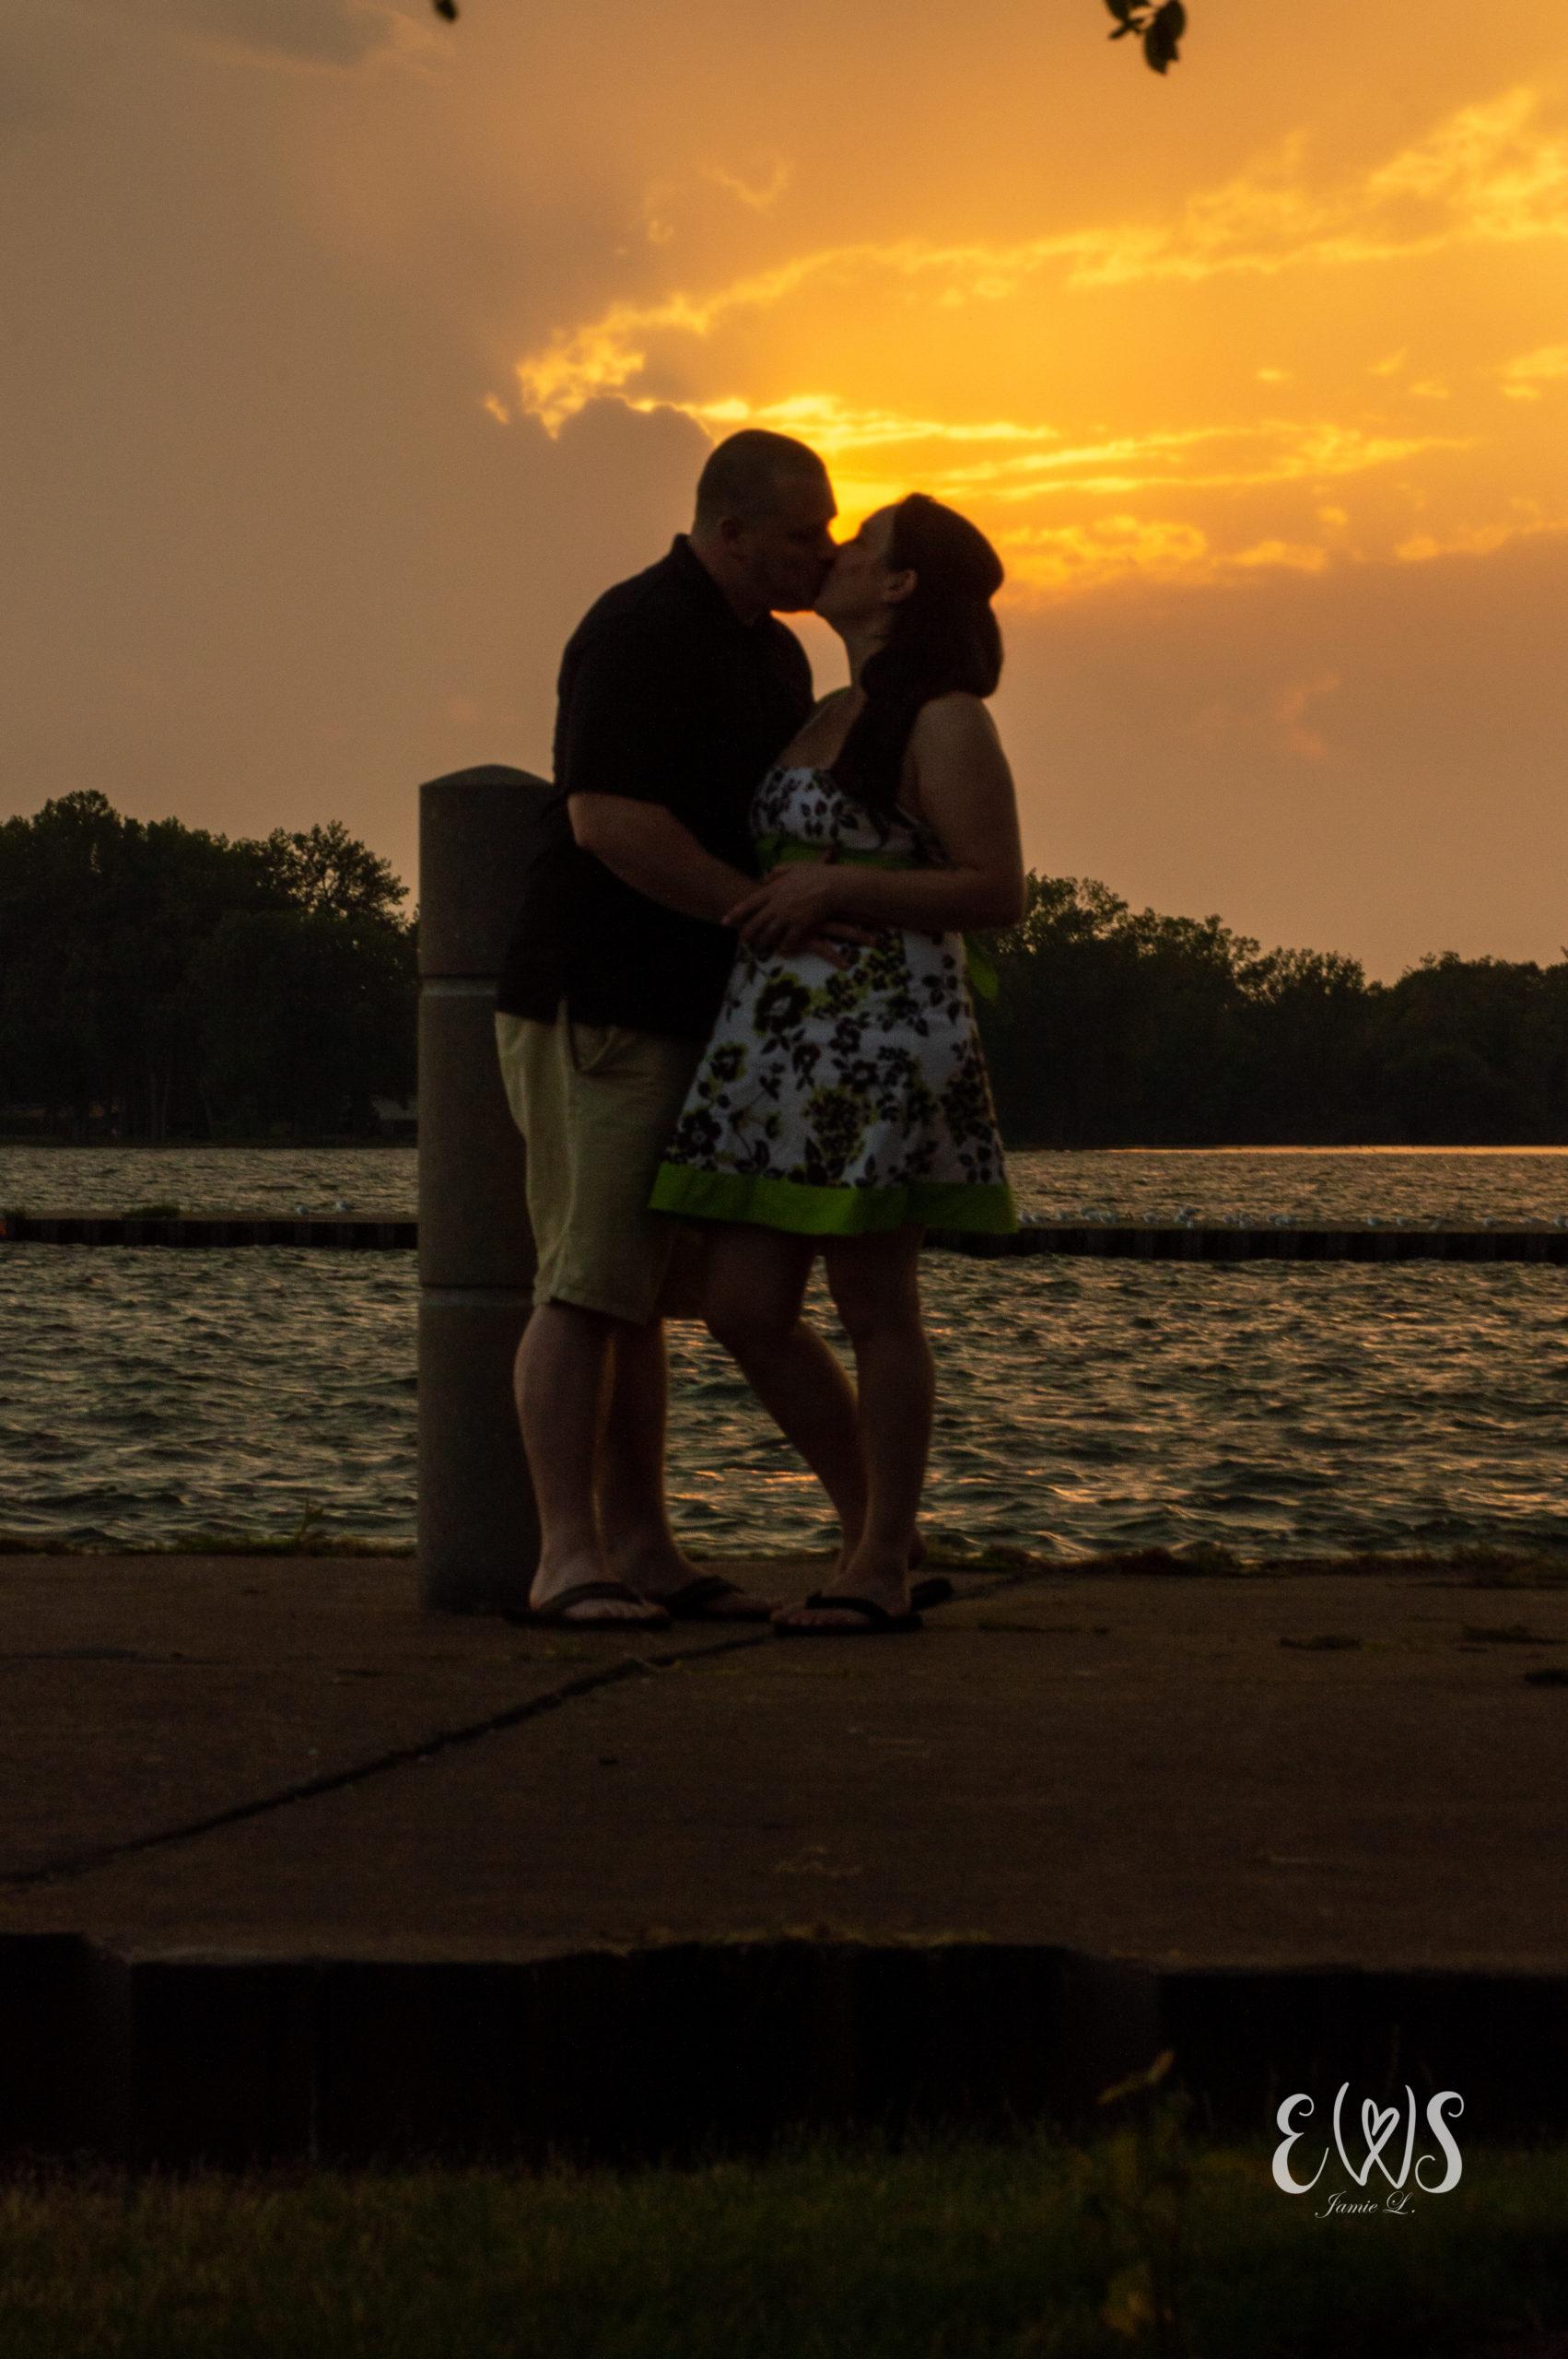 Best Places for Engagement Photos